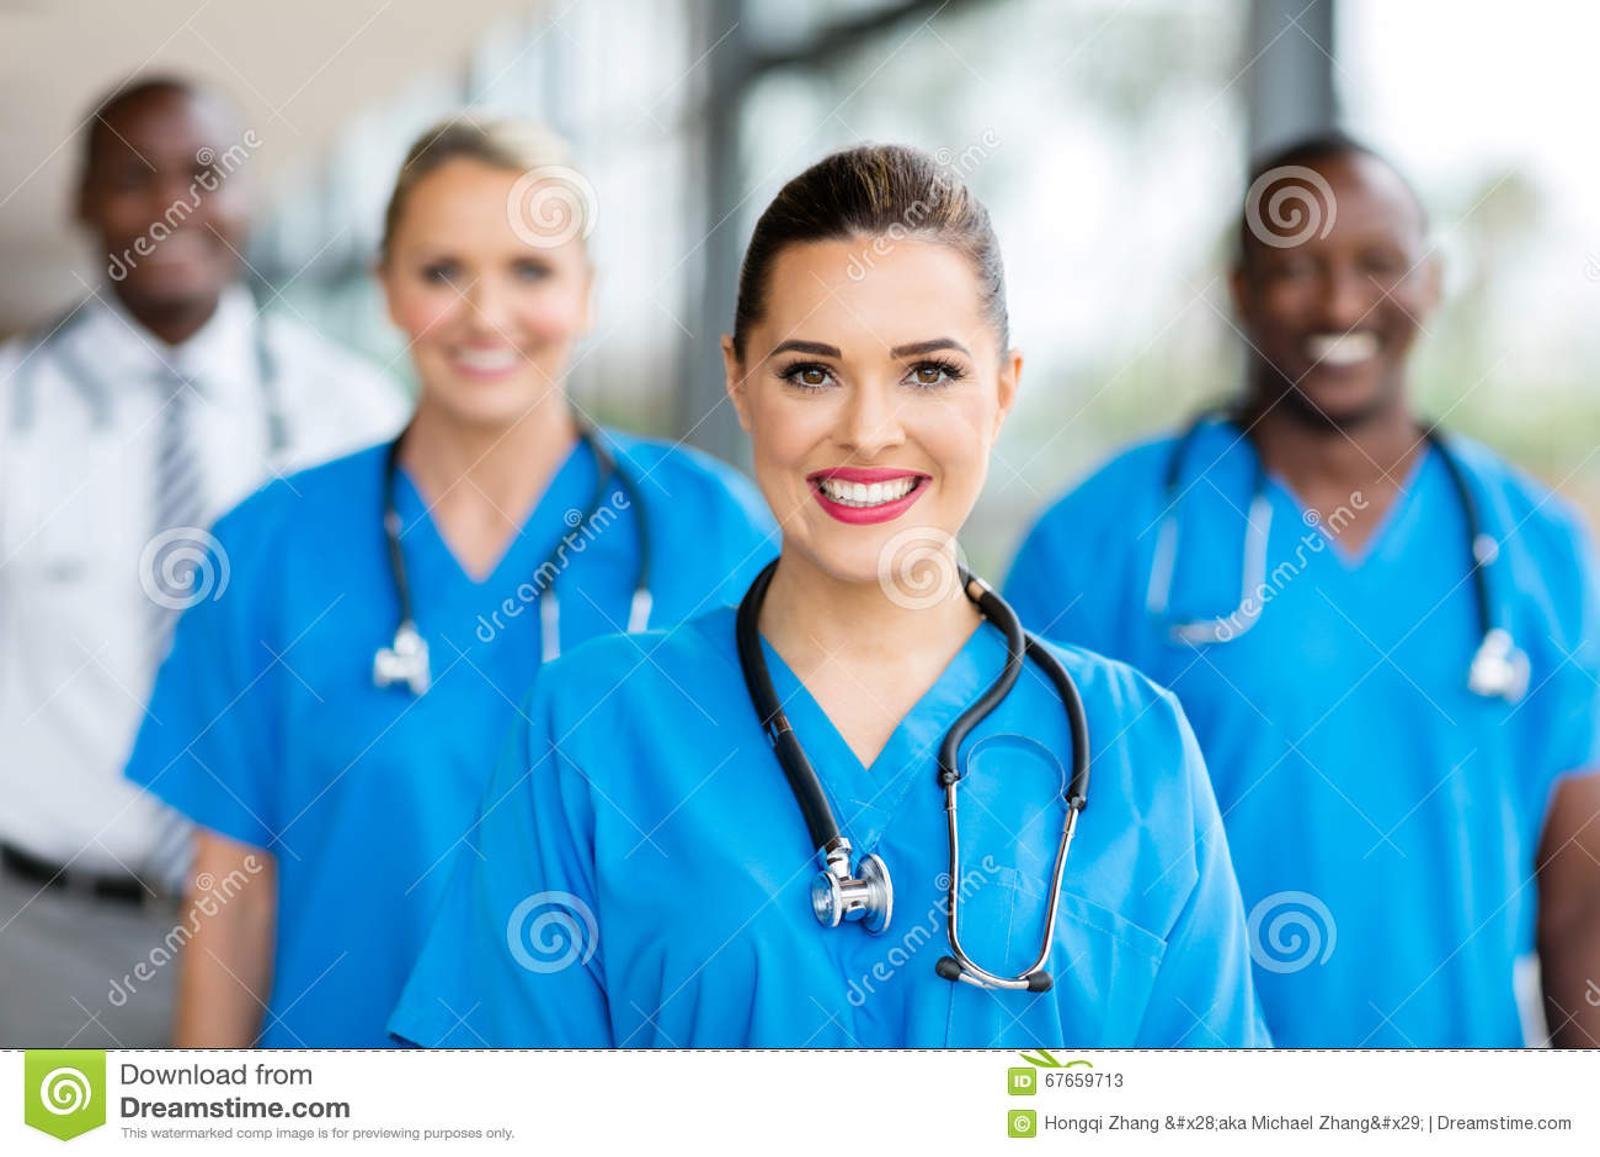 Медицинские коллегаы нюни